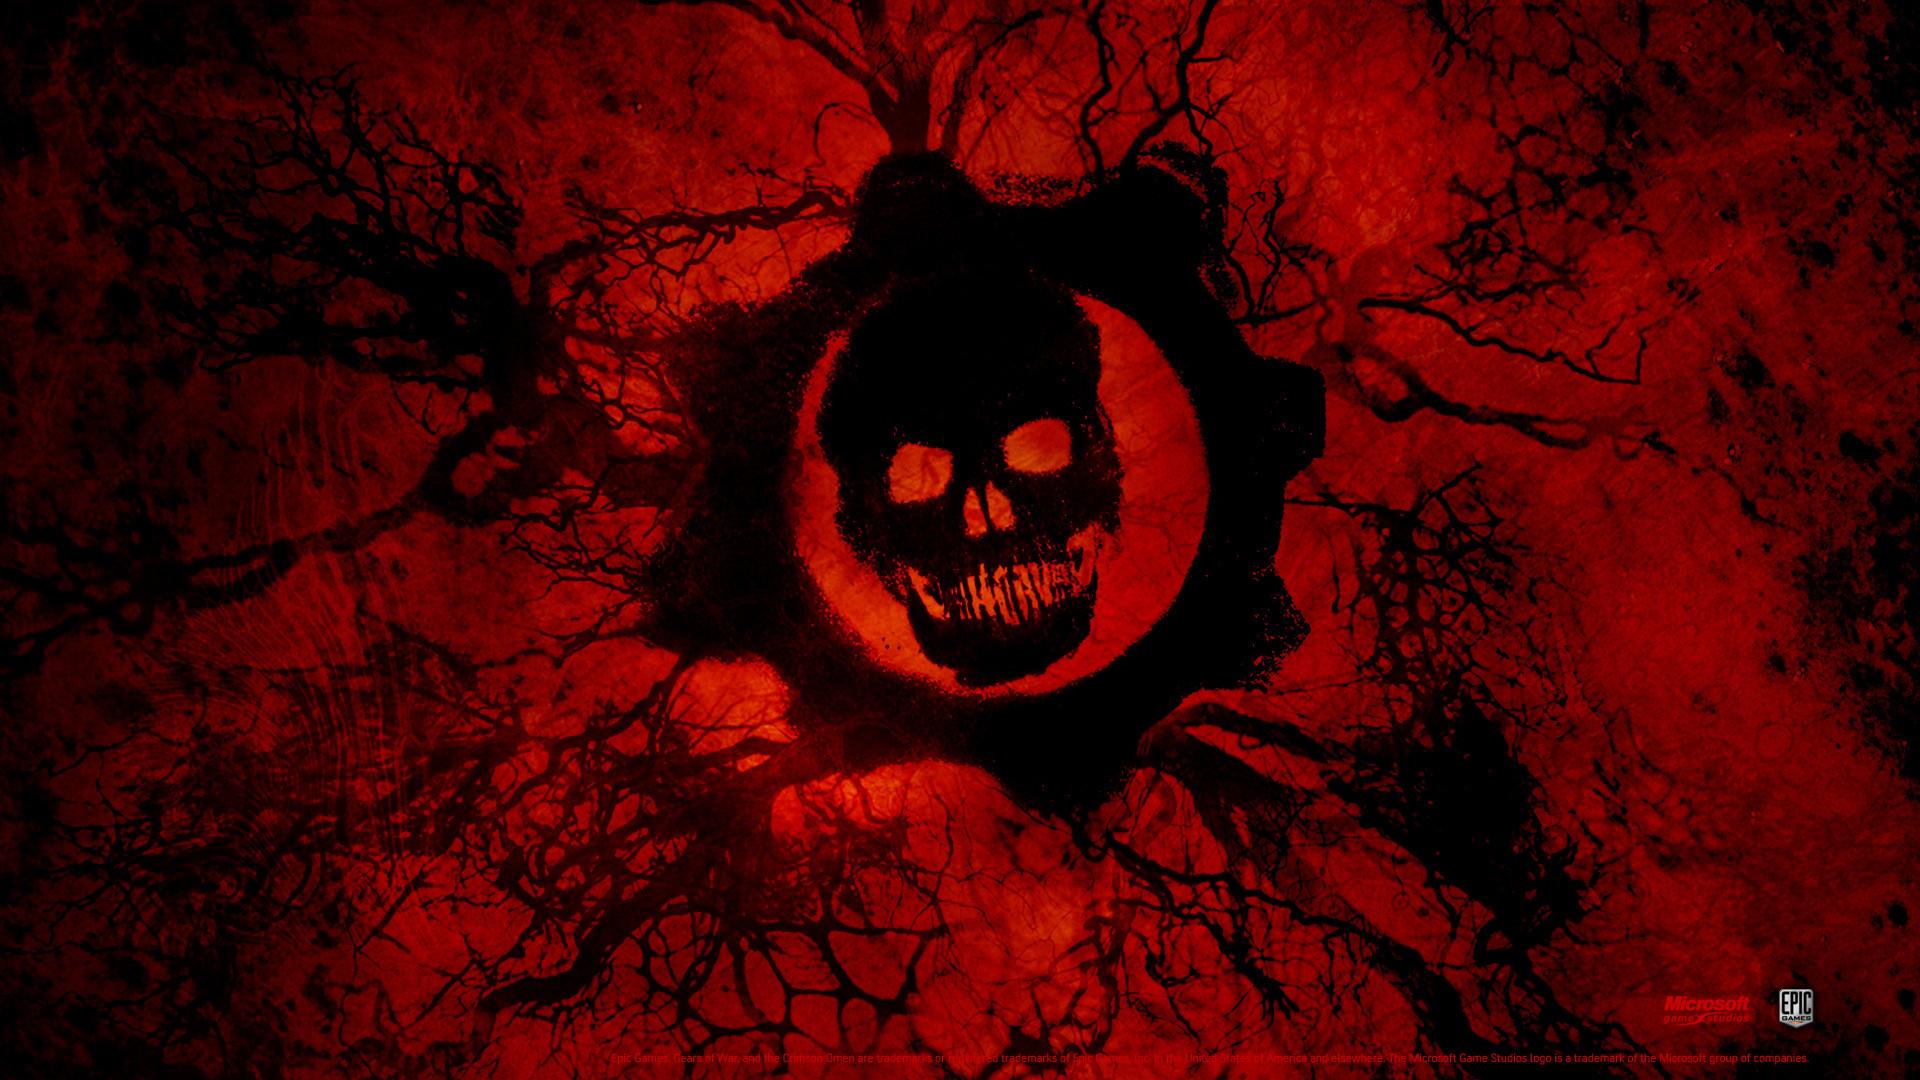 Gears Of War HD Gaming Wallpaper